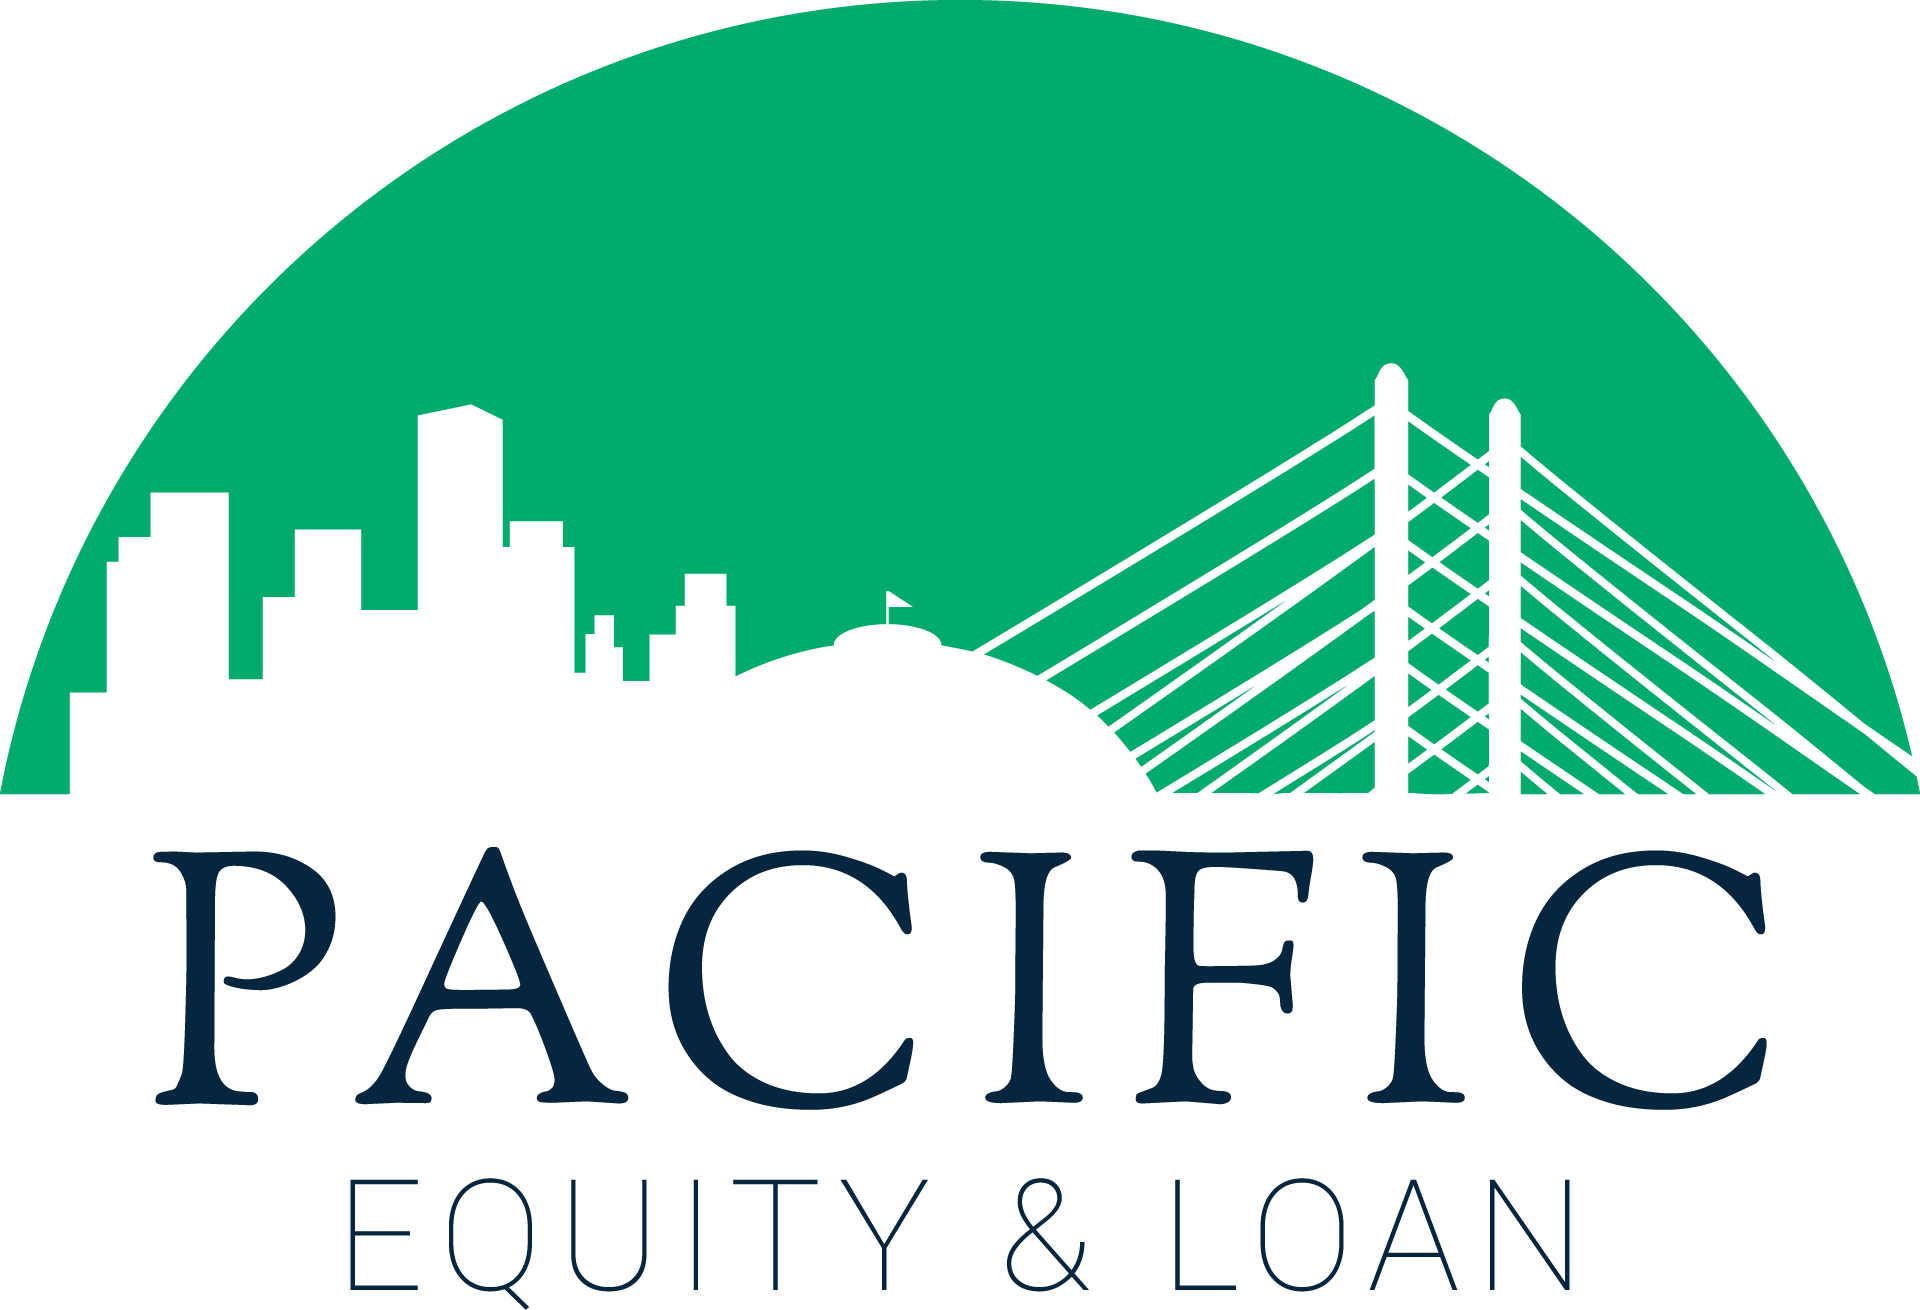 Pacific Equity & Loan